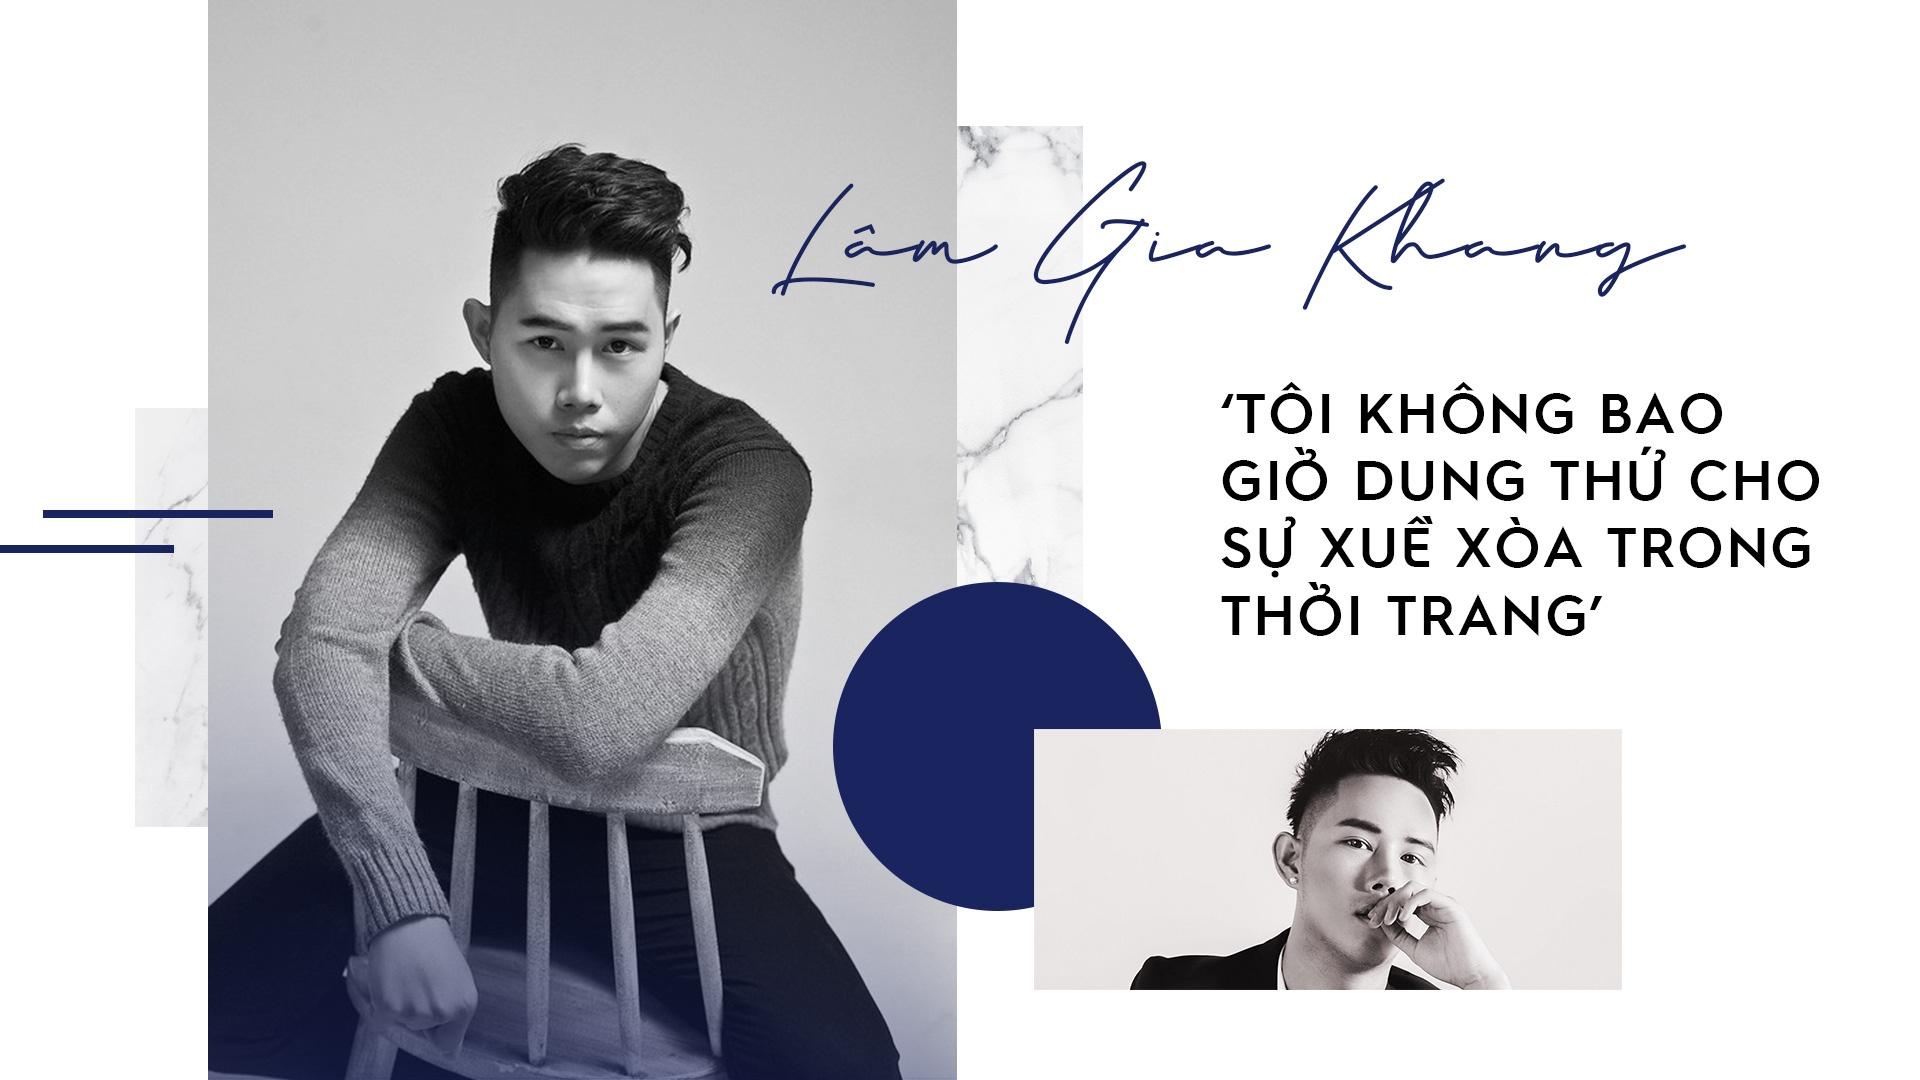 Lam Gia Khang: 'Toi khong dung thu cho su xue xoa trong thoi trang' hinh anh 2